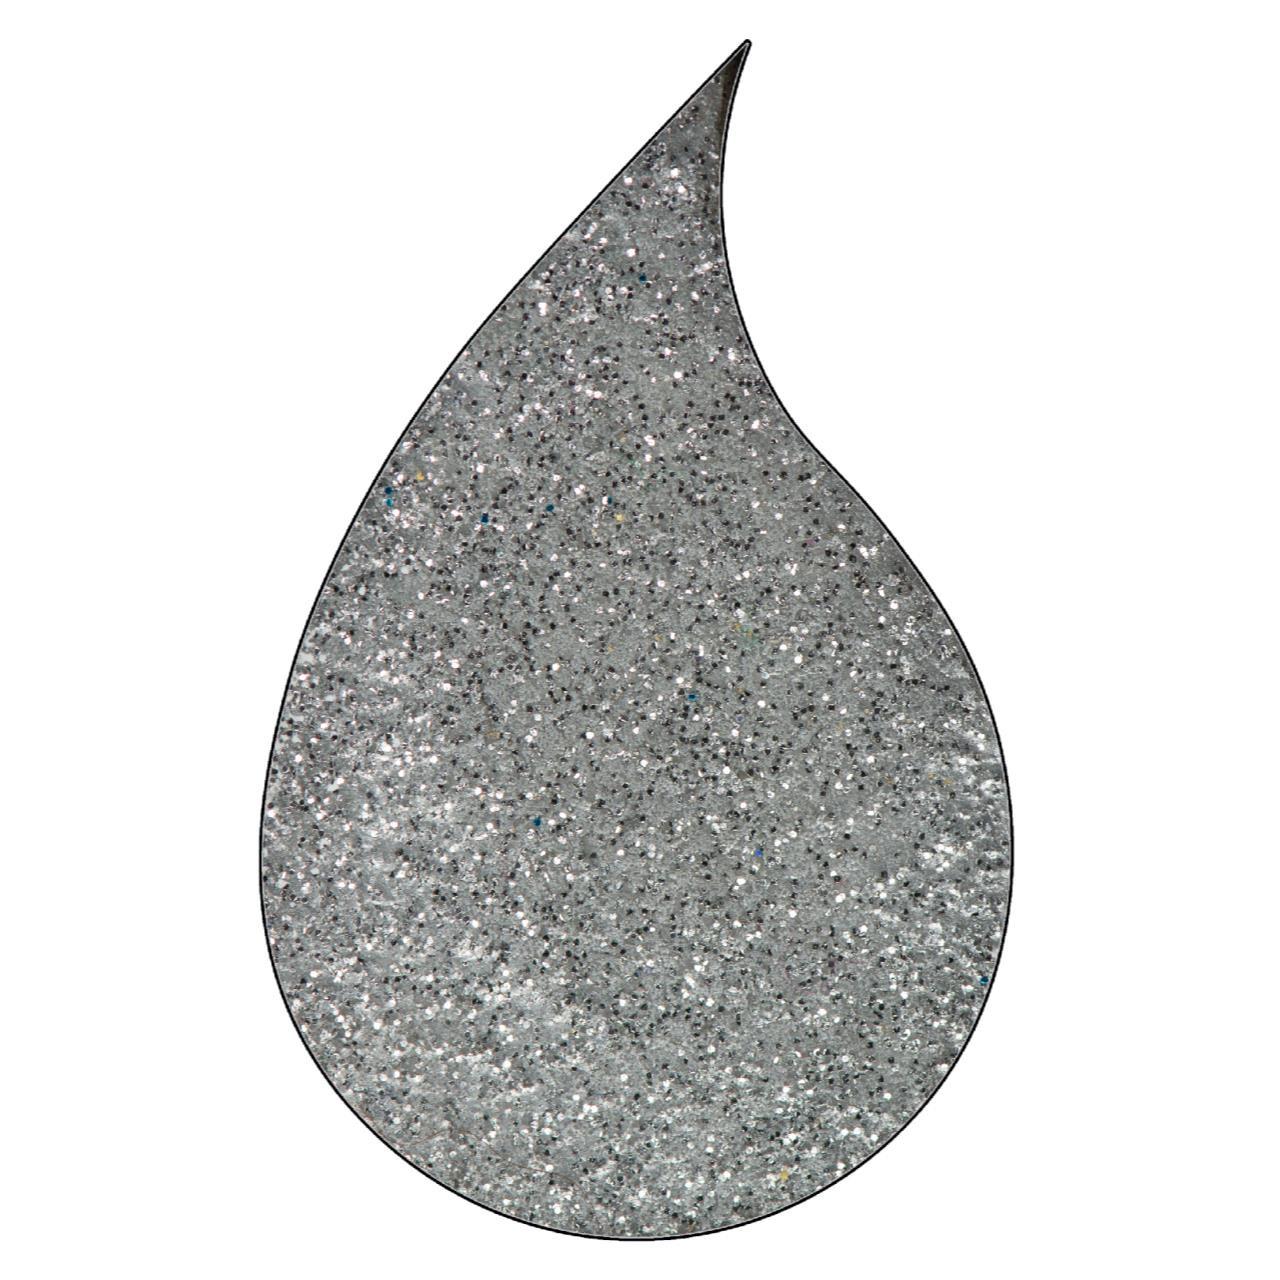 WOW Embossing Powder, Regular - Metallic Silver Sparkle -